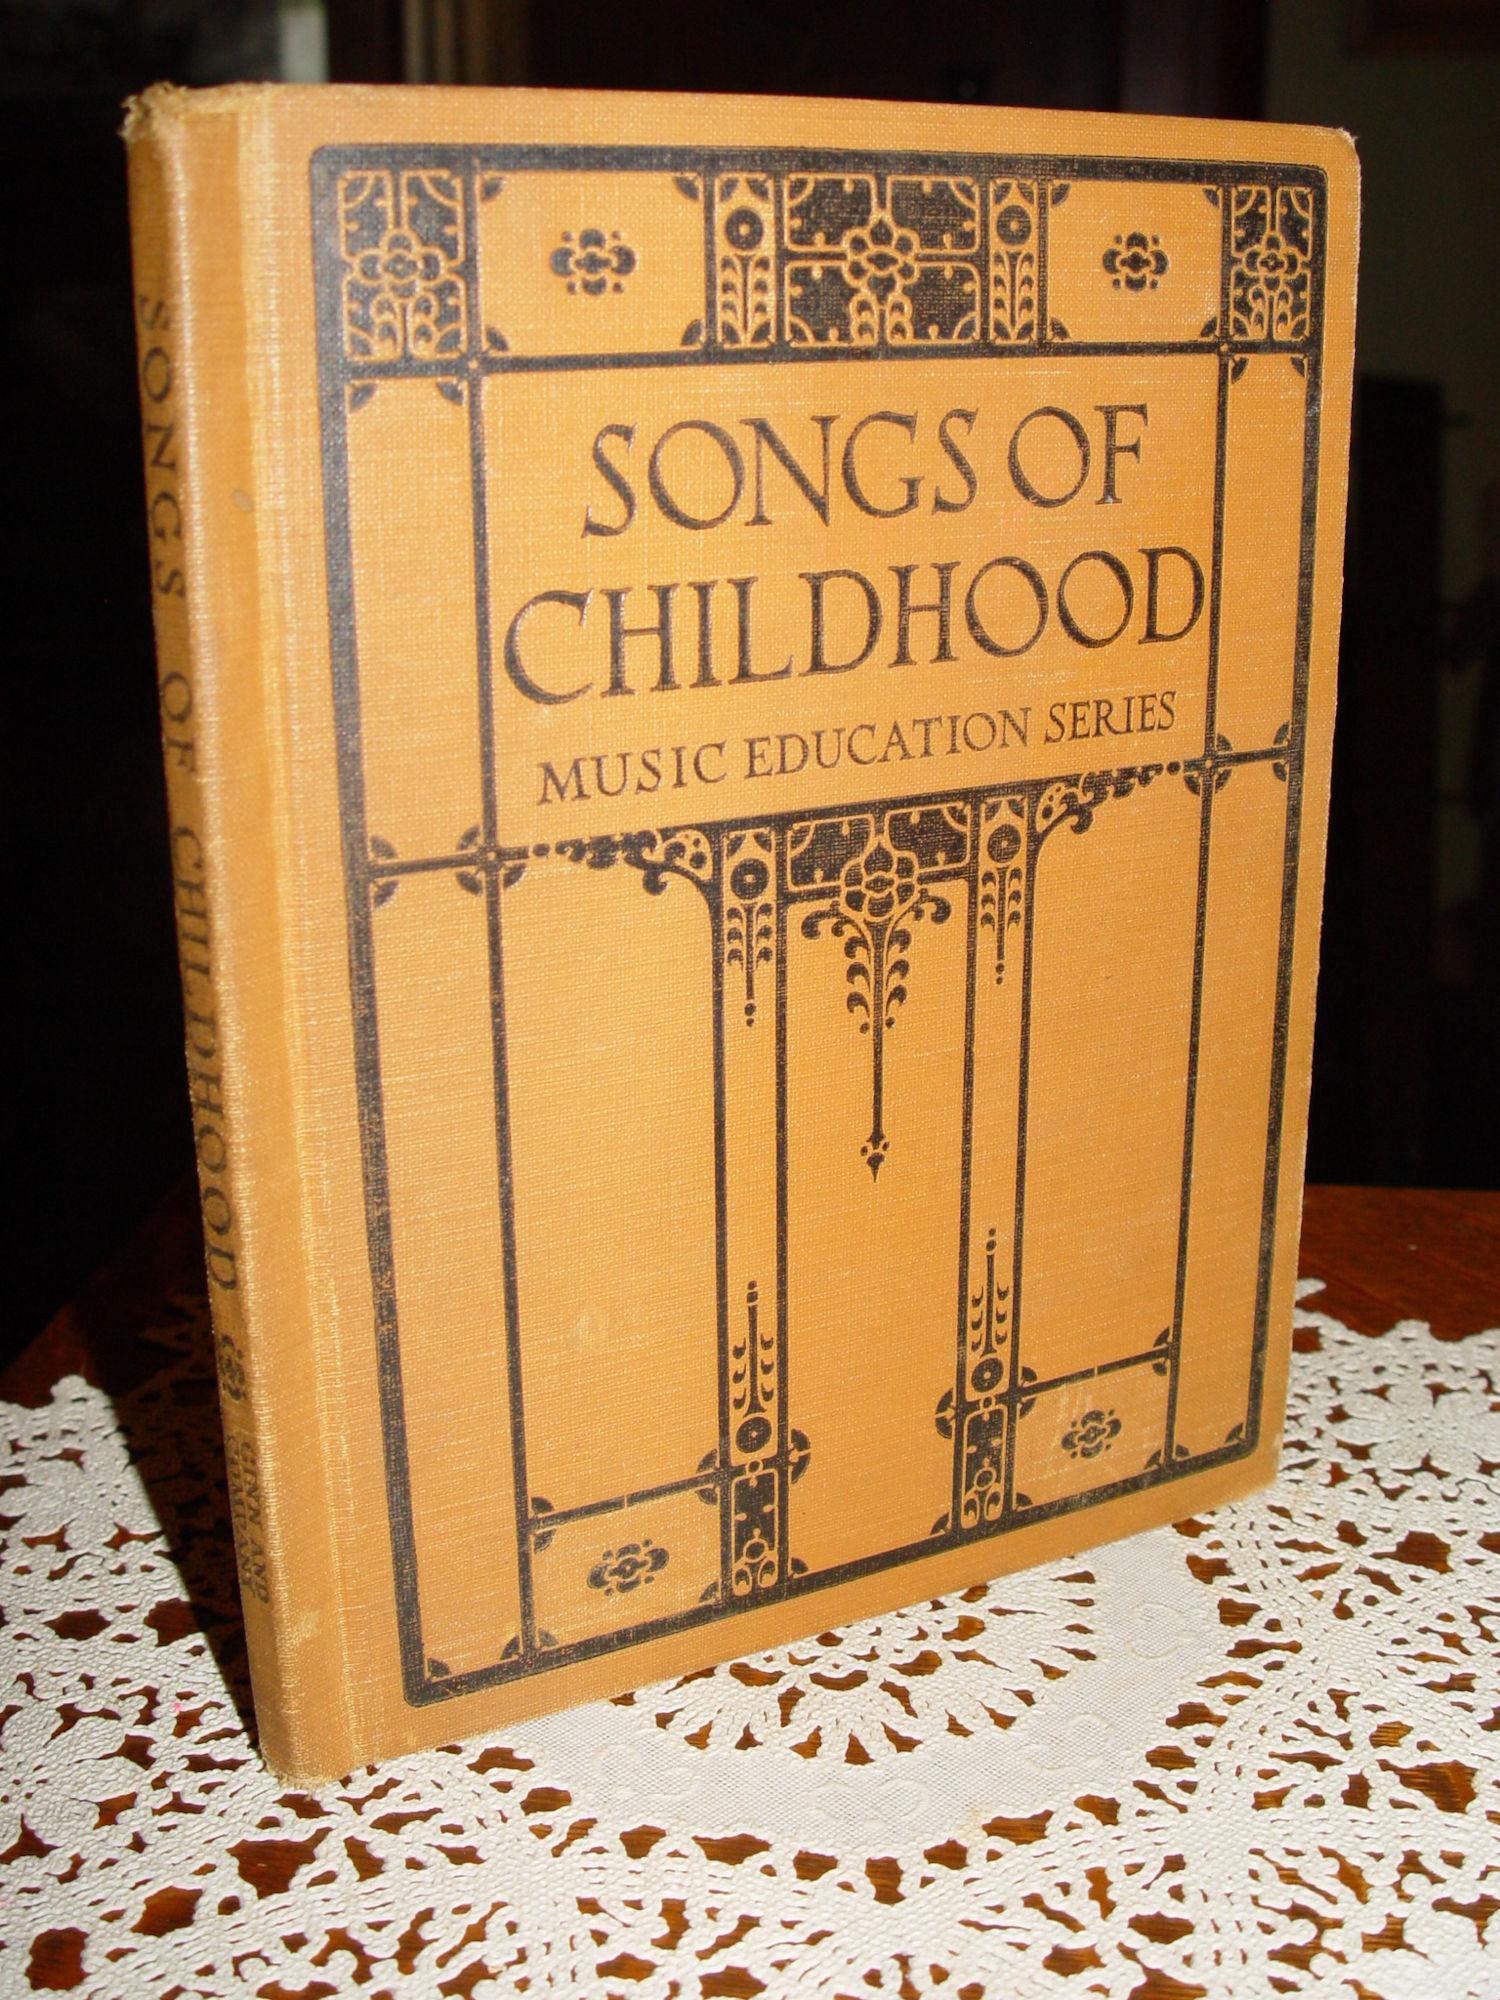 Hemlands-Klockan Hymn book                                         by Andgila Sanger. Publisher P.                                         Benson 1907 Swedish hymnal